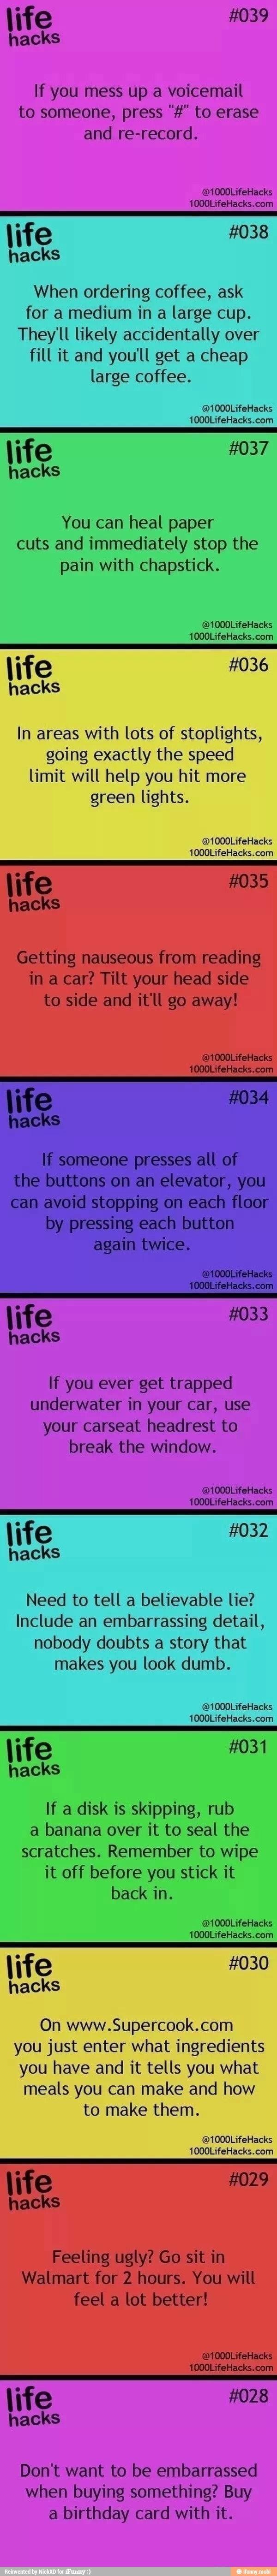 Life hacks :)